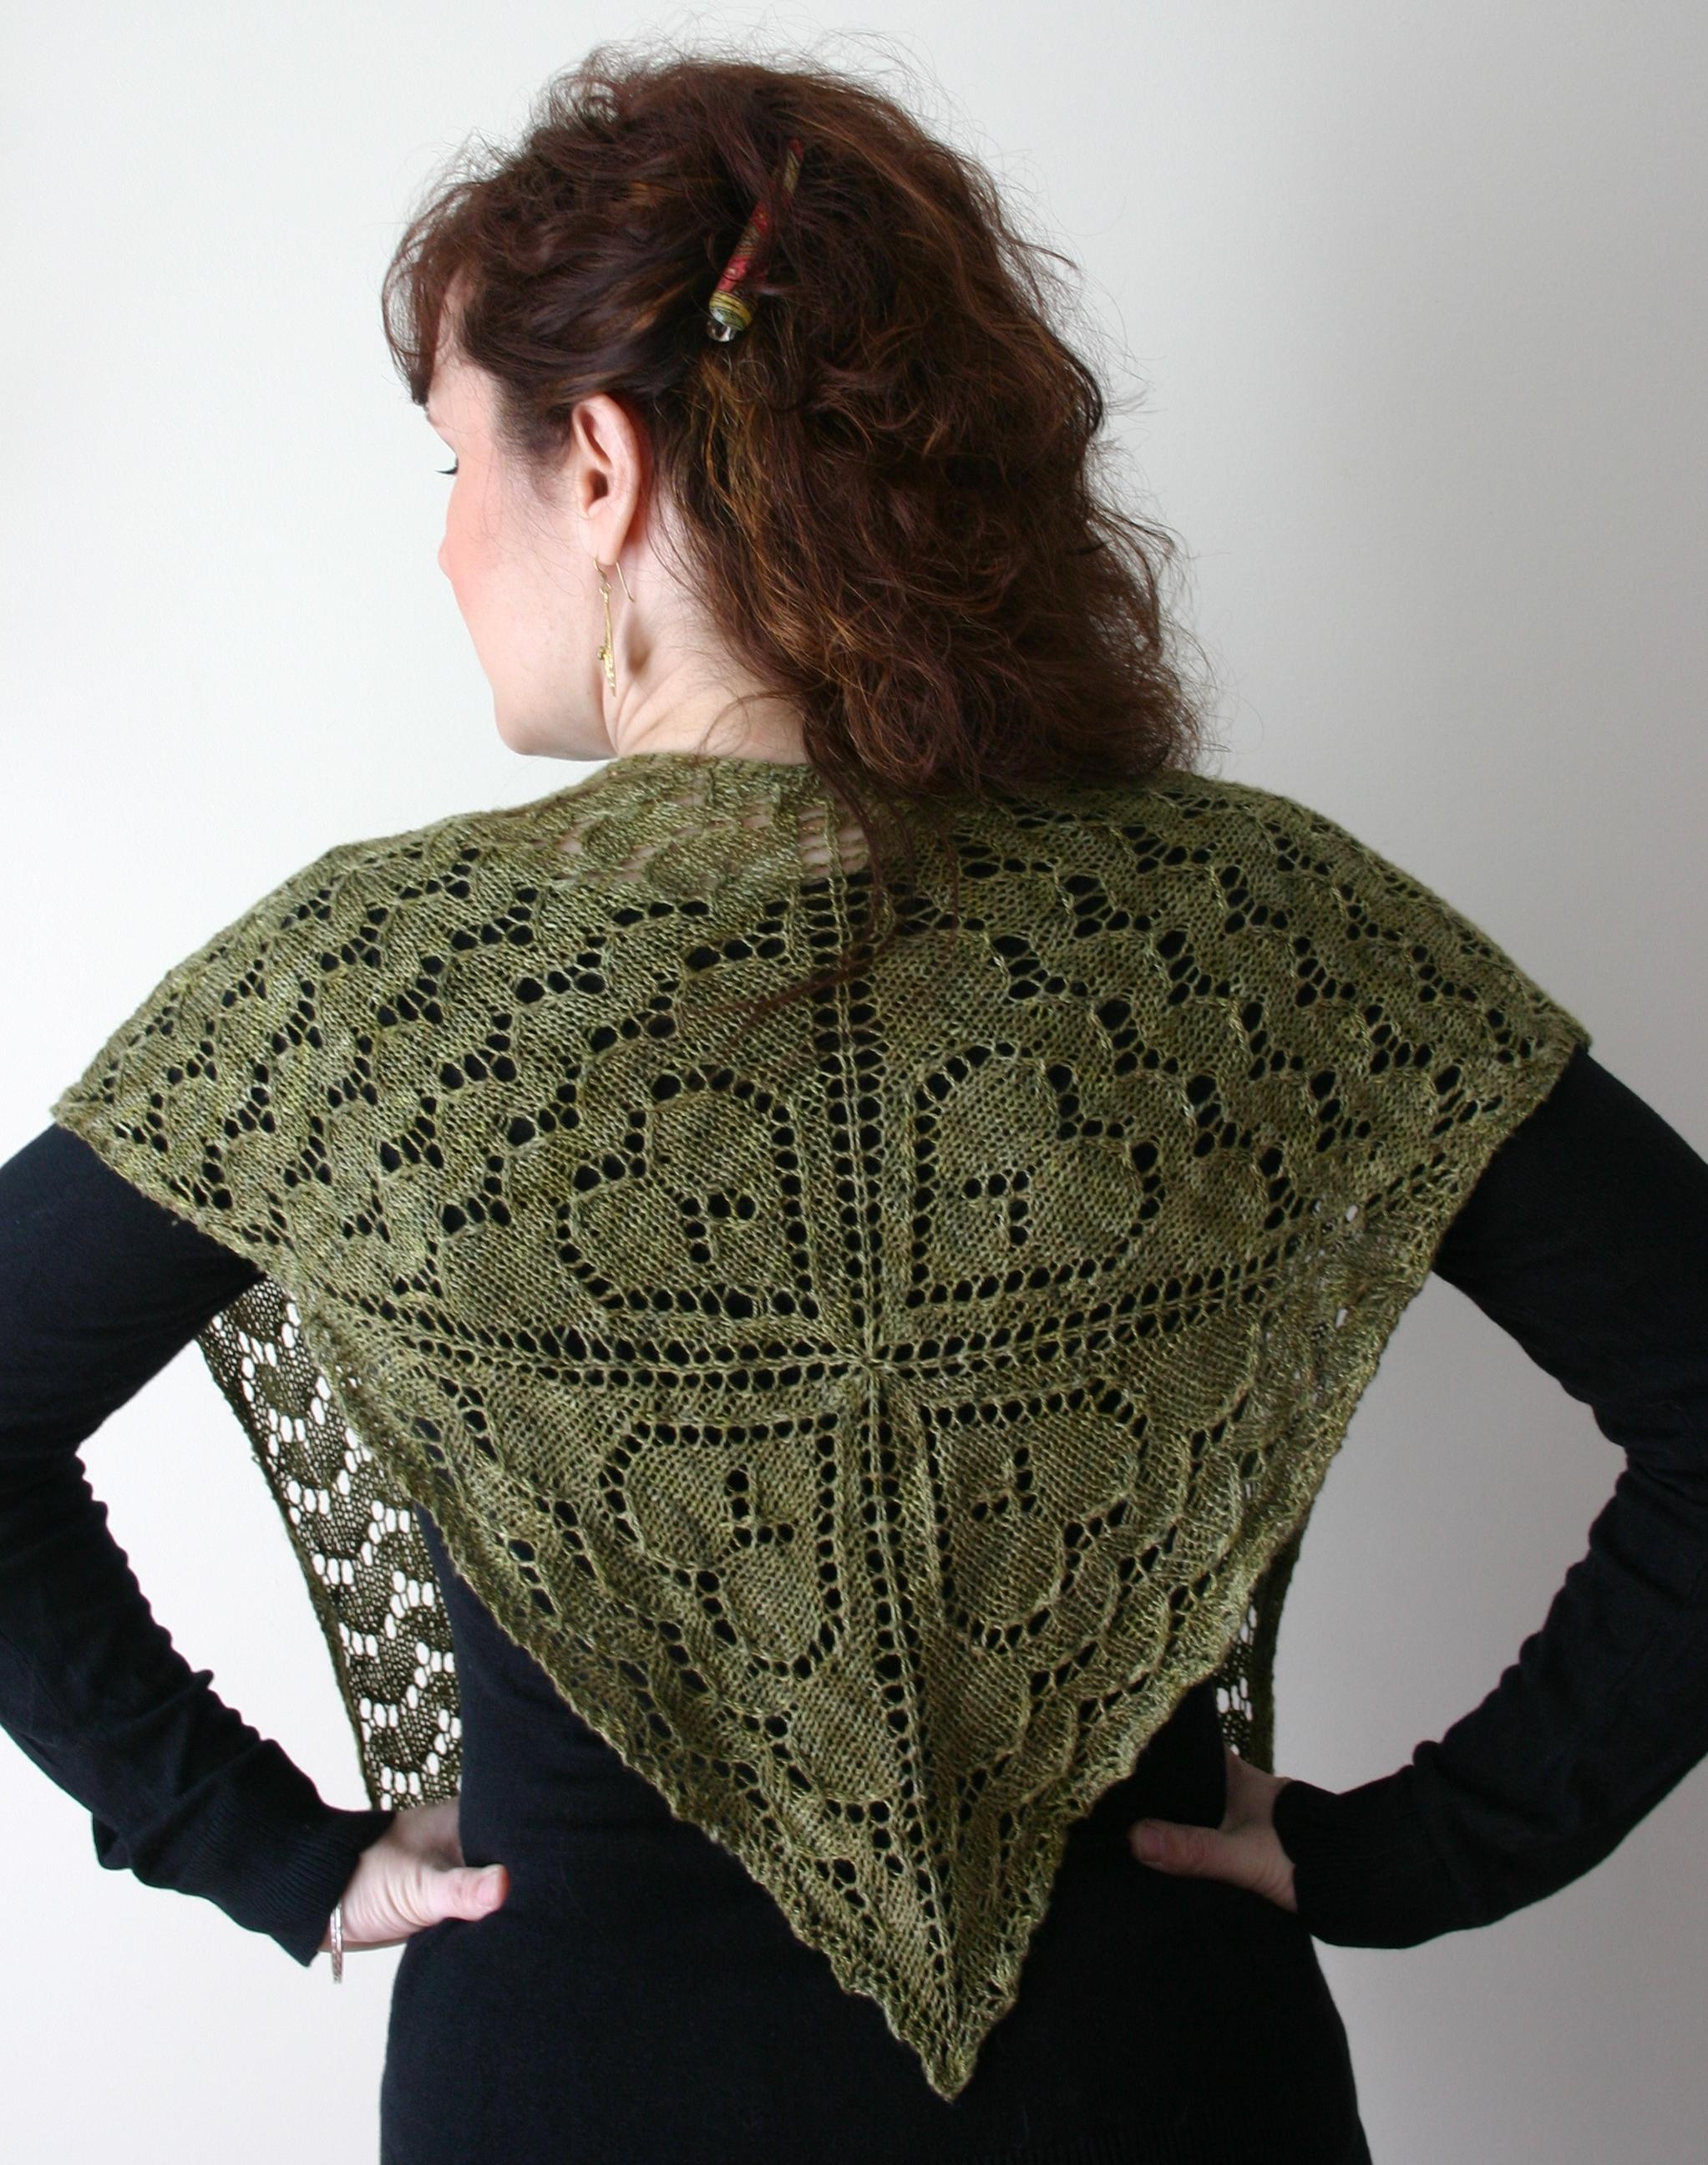 blog | Natalie Servant Designs | Carefully crafted knitting patterns ...